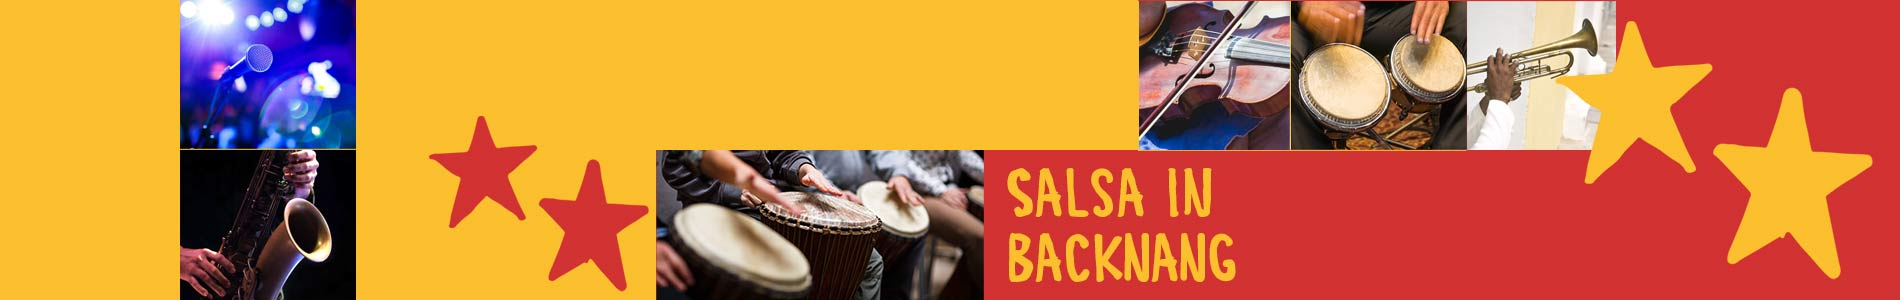 Salsa in Backnang – Salsa lernen und tanzen, Tanzkurse, Partys, Veranstaltungen